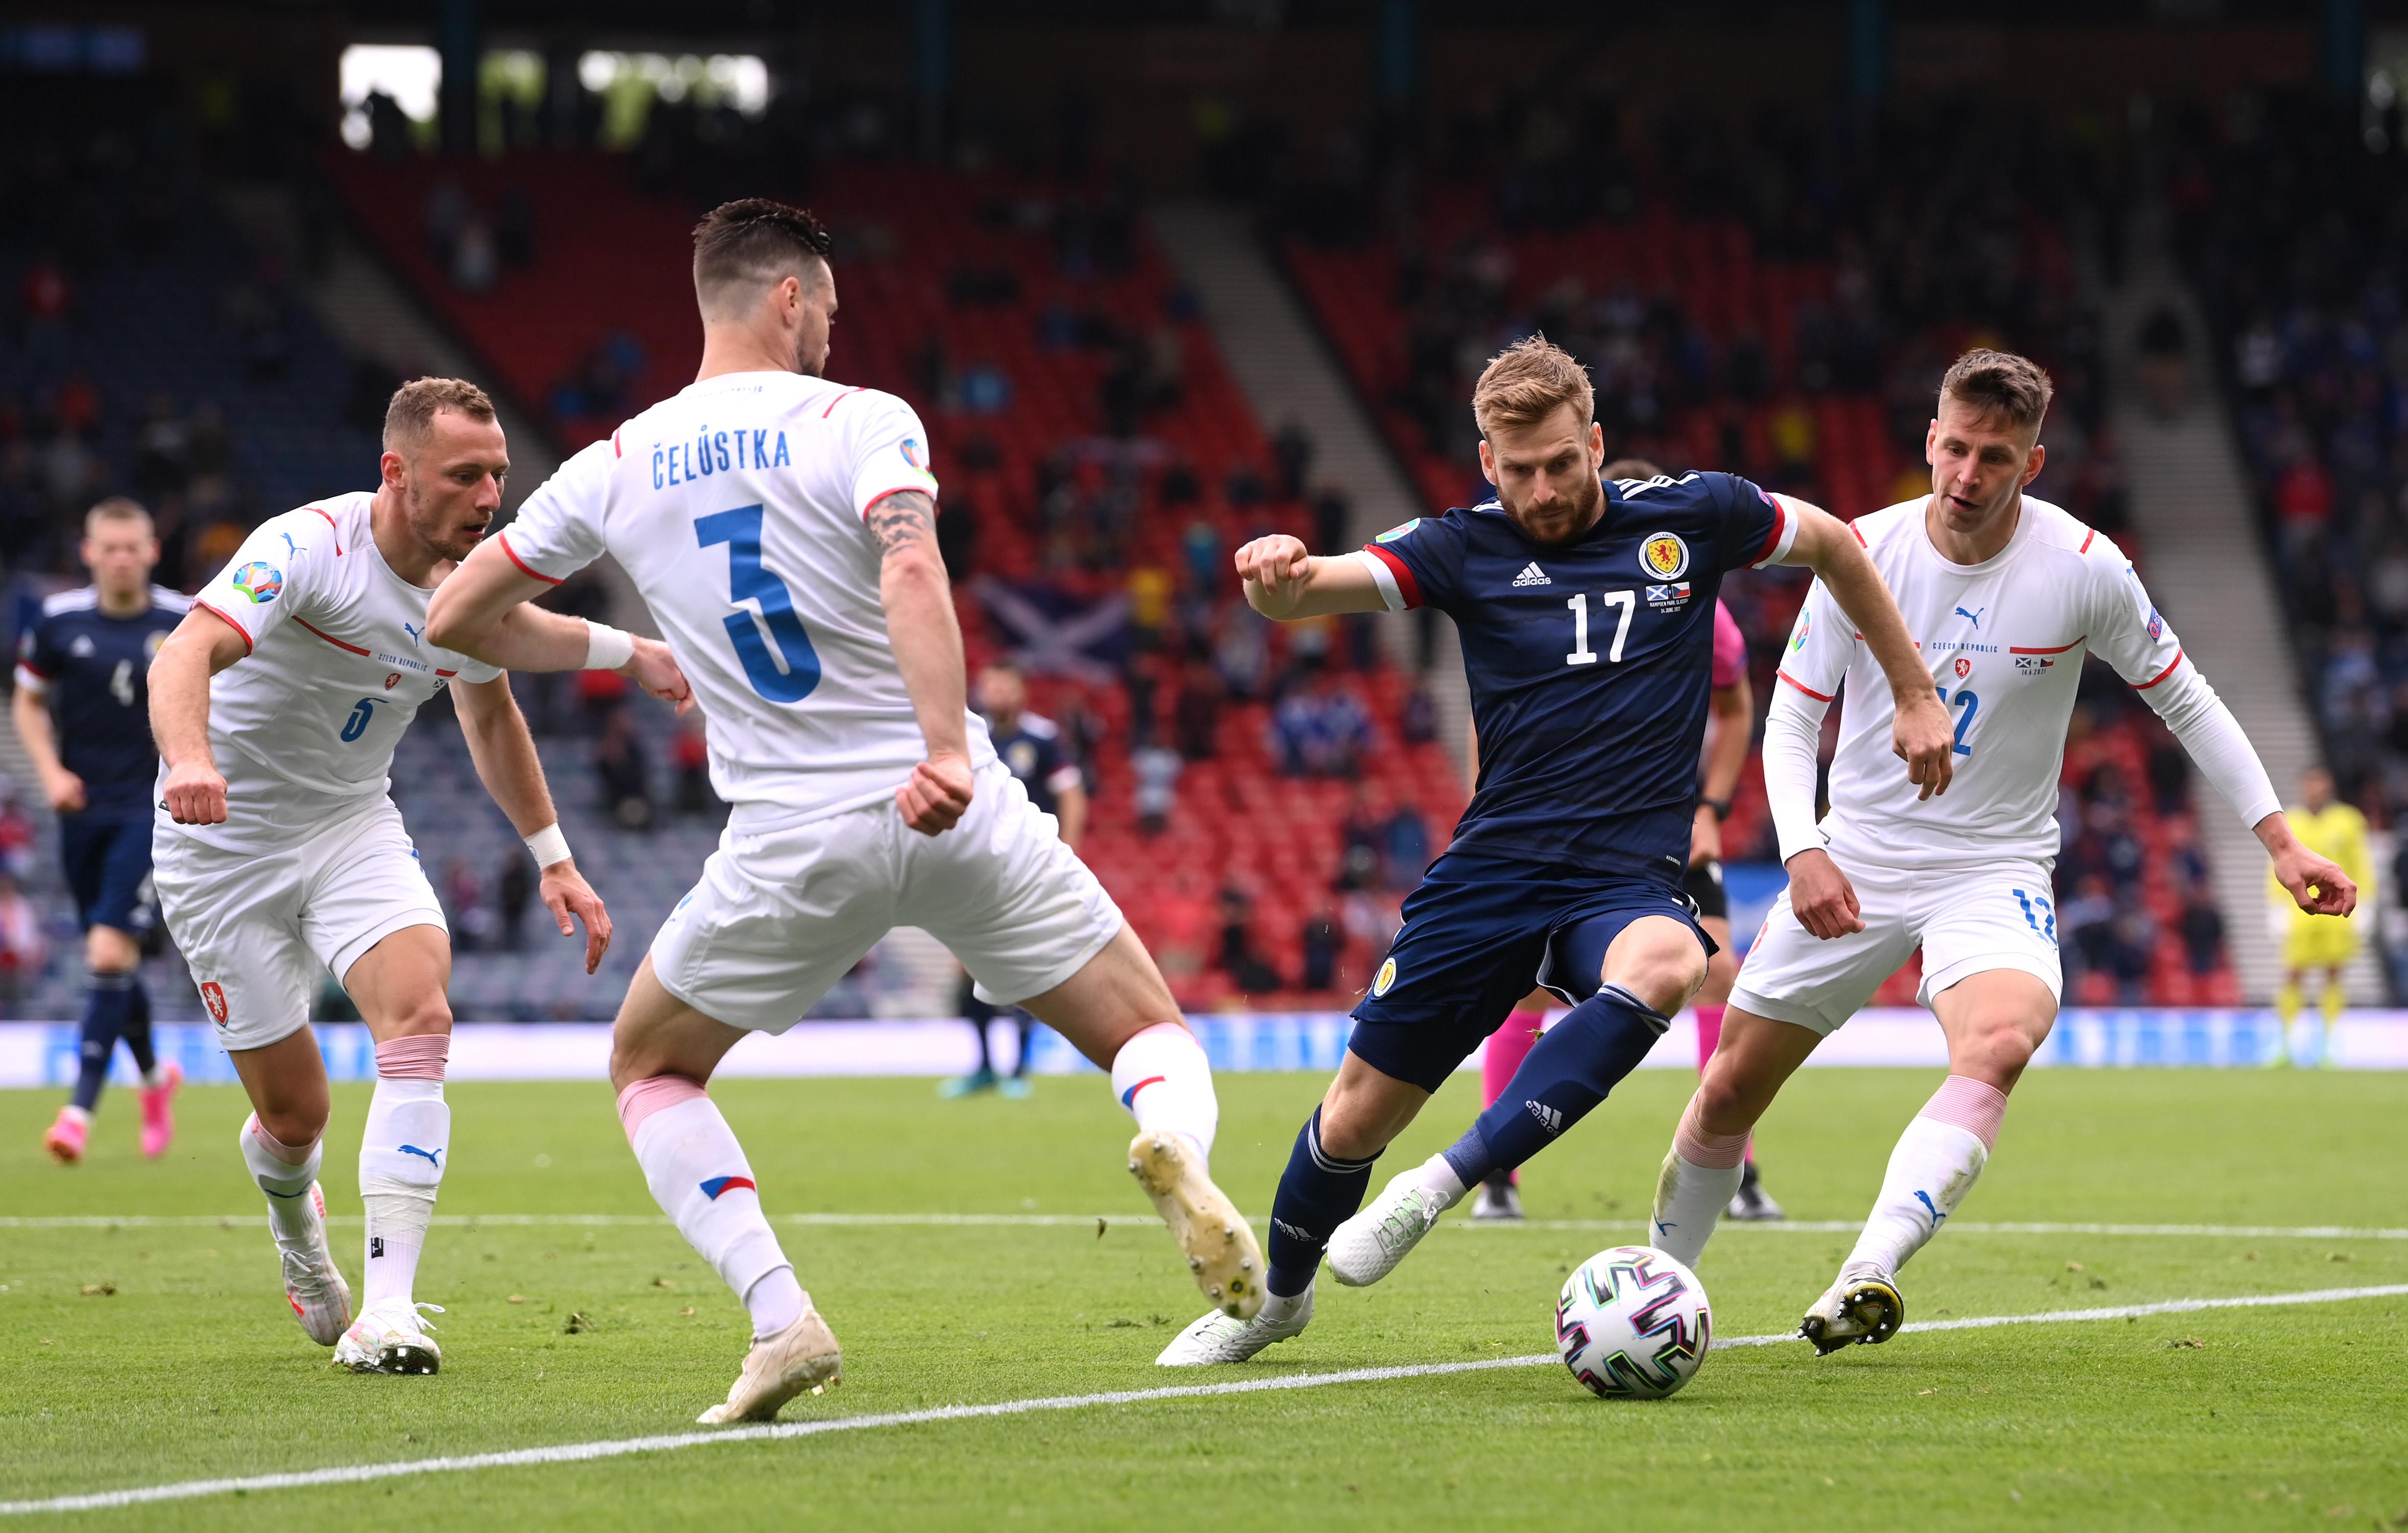 Southampton, international, EURO 2020, Scotland, Denmark, Poland, Stuart Armstrong, Che Adams, Jan Bednarek, Jannik Vestergaard